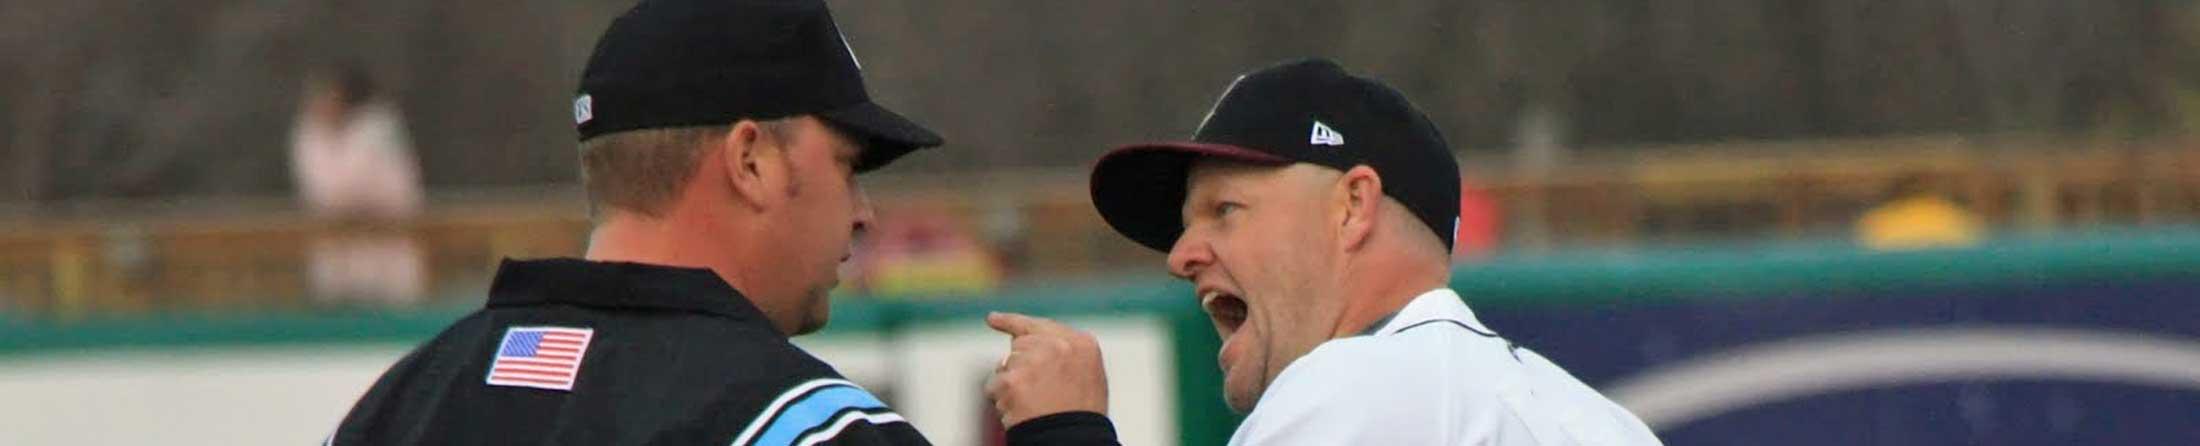 Arguing with Umpire - header